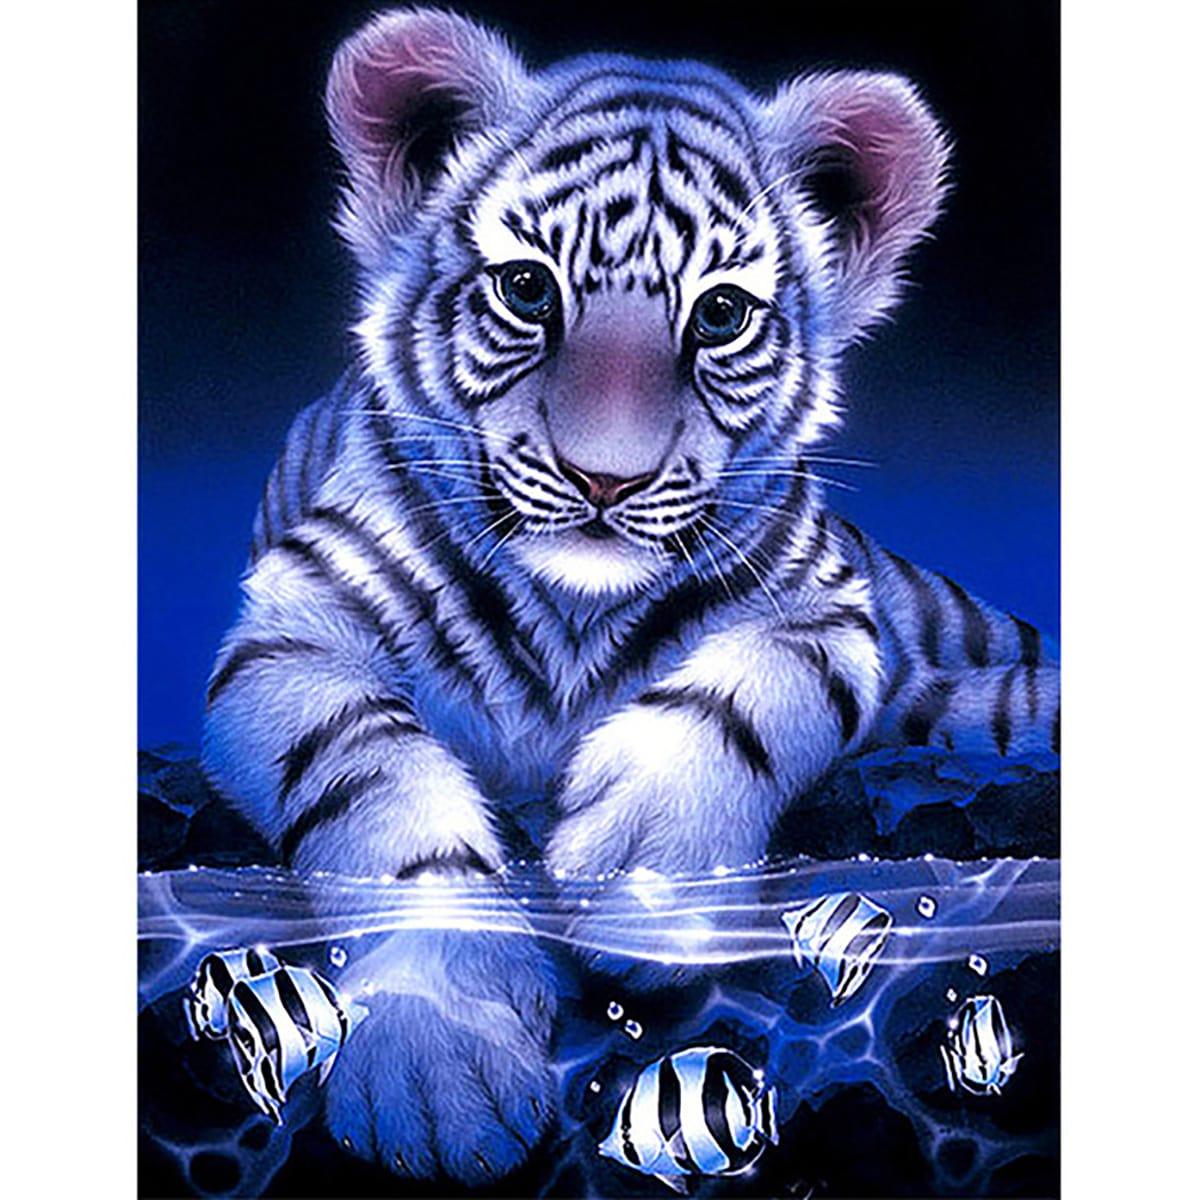 Diamand Malerei mit Tiger Muster ohne Rahmen